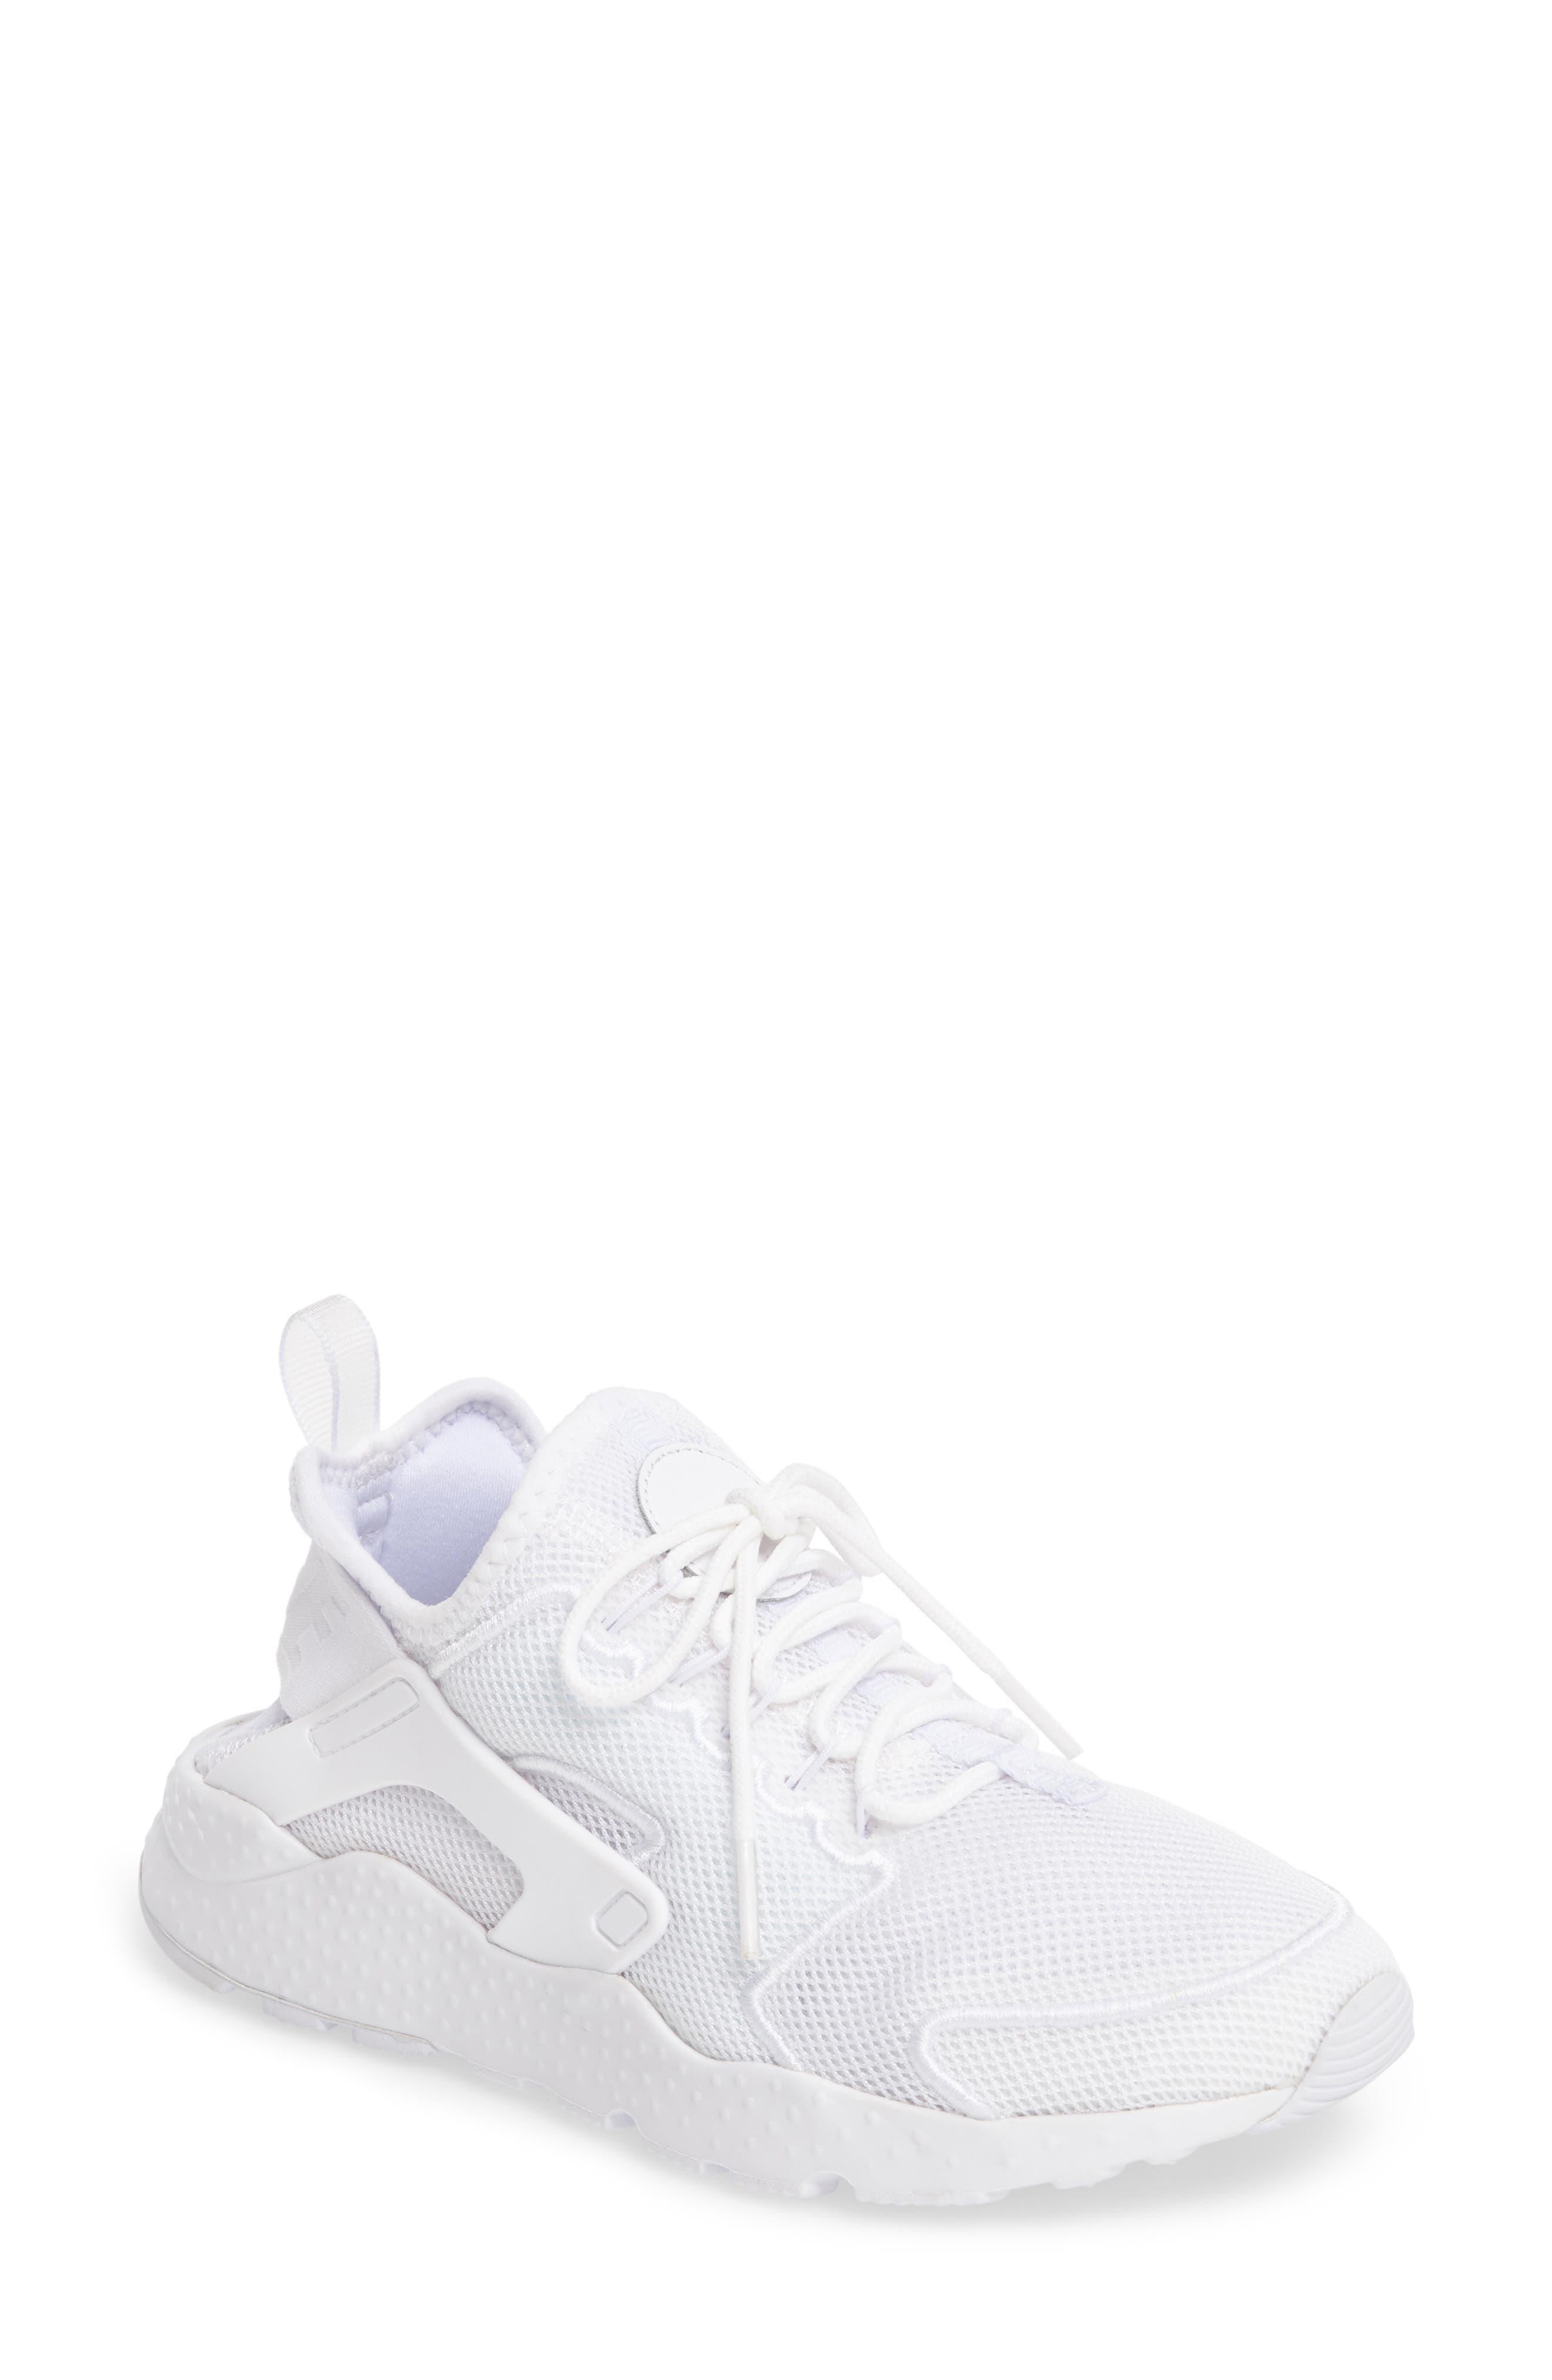 Alternate Image 1 Selected - Nike 'Air Huarache Run Ultra Mesh' Sneaker (Women)